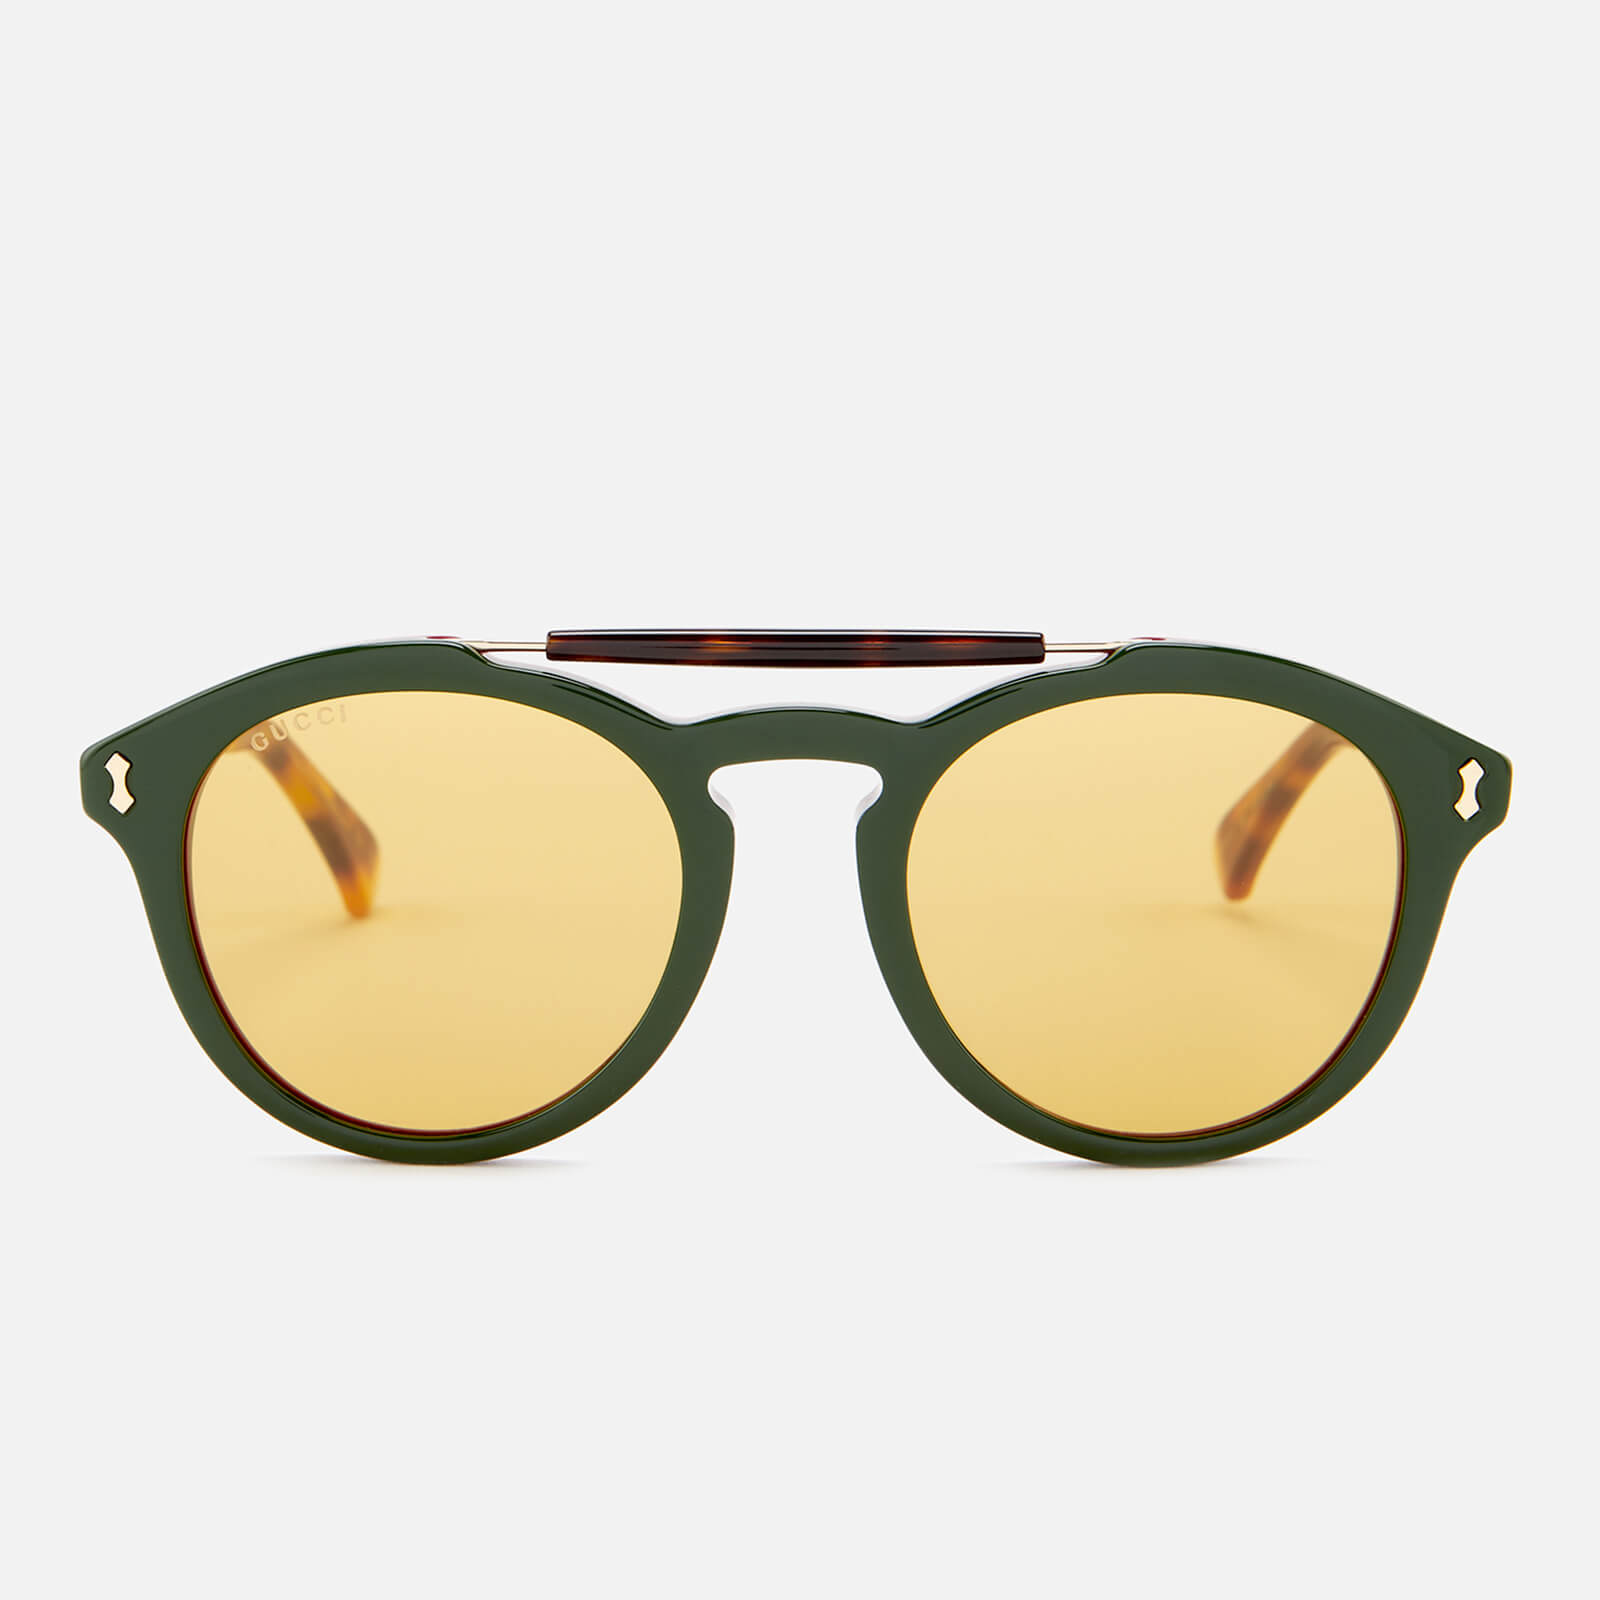 51c03b2b4da3 Gucci Men's Flip Top Aviator Sunglasses - Havana/Green - Free UK Delivery  over £50